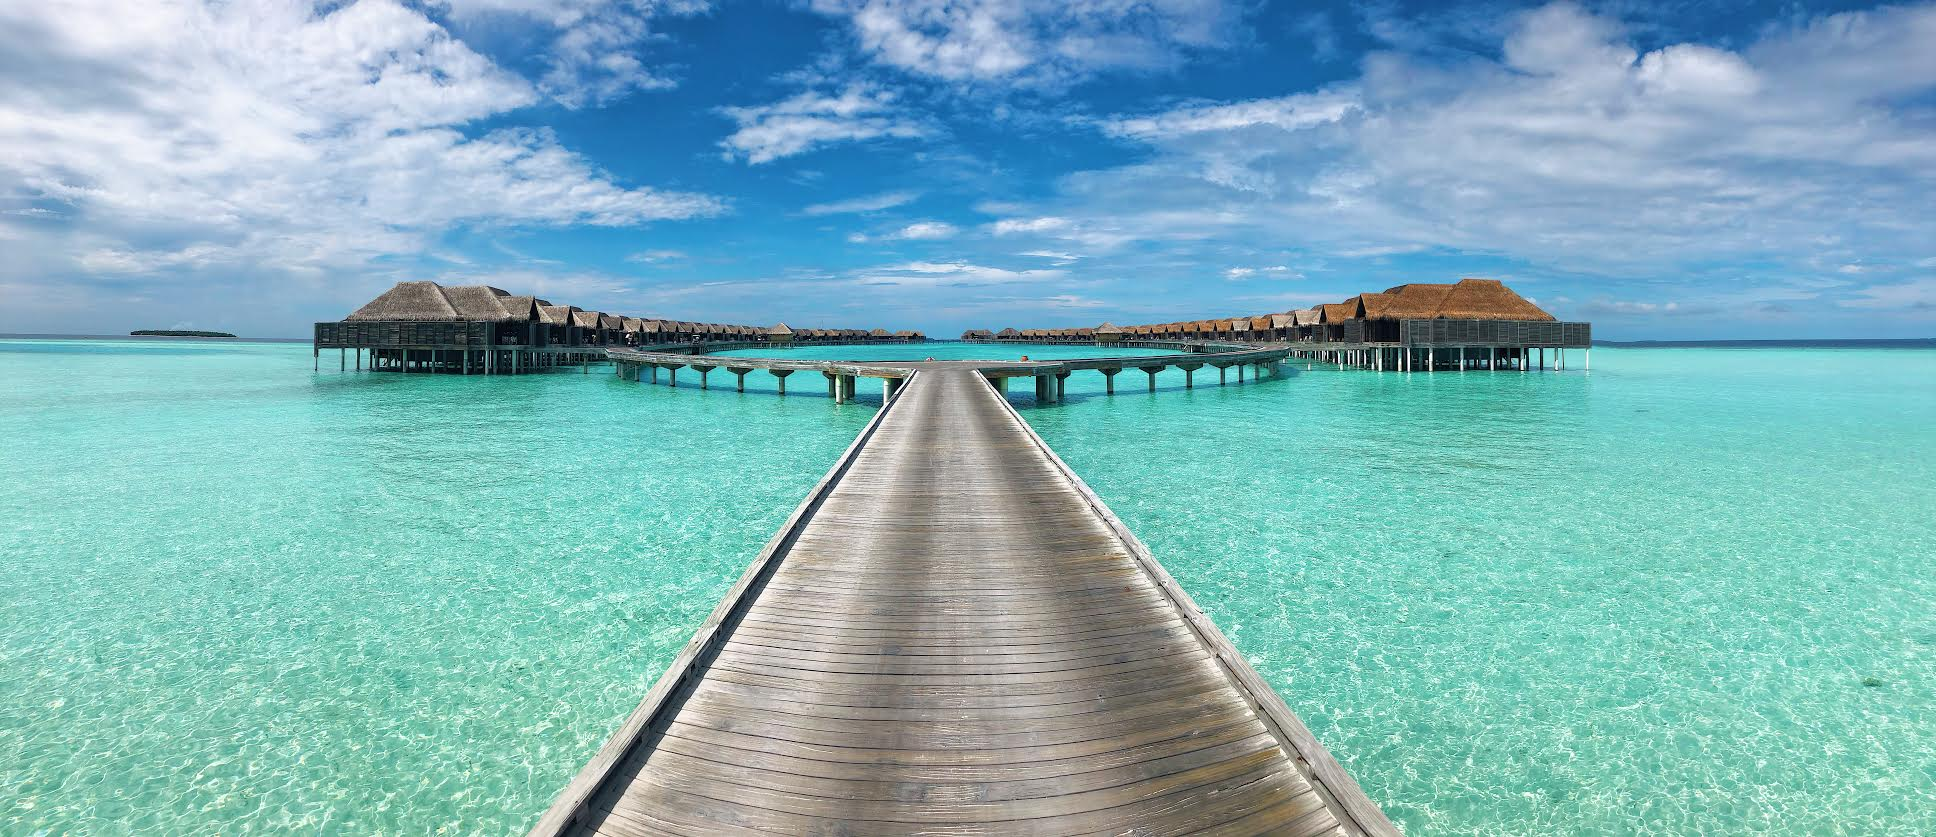 Best-Maldives-travel-guide-tips-Muslim-blog-overwater-villas